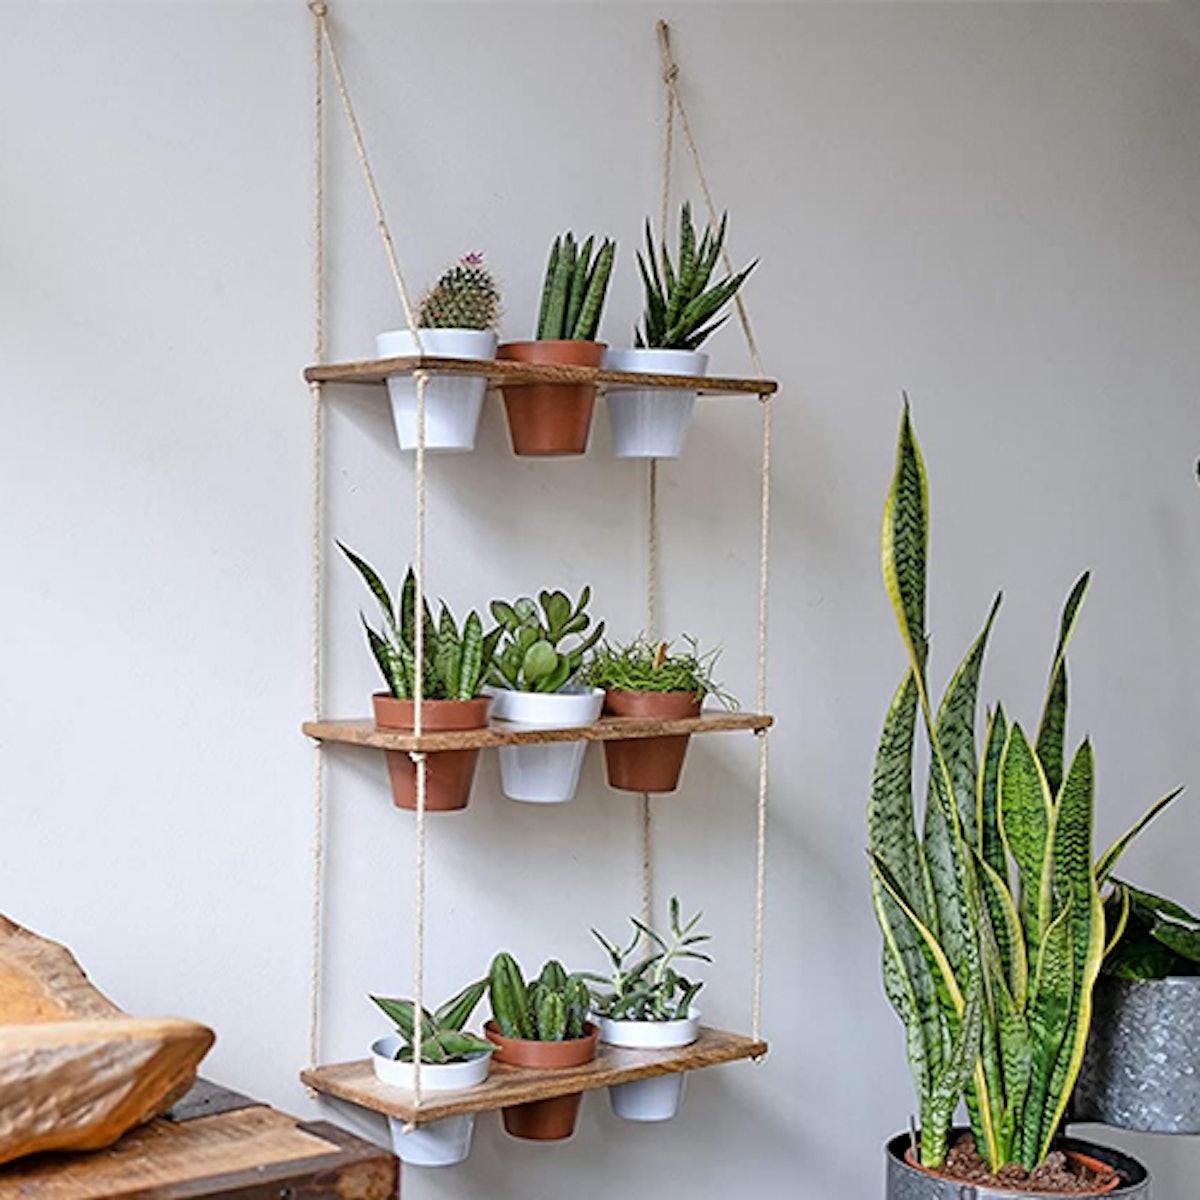 Kimisty Three-Tiered Hanging Planter Shelf With Pots